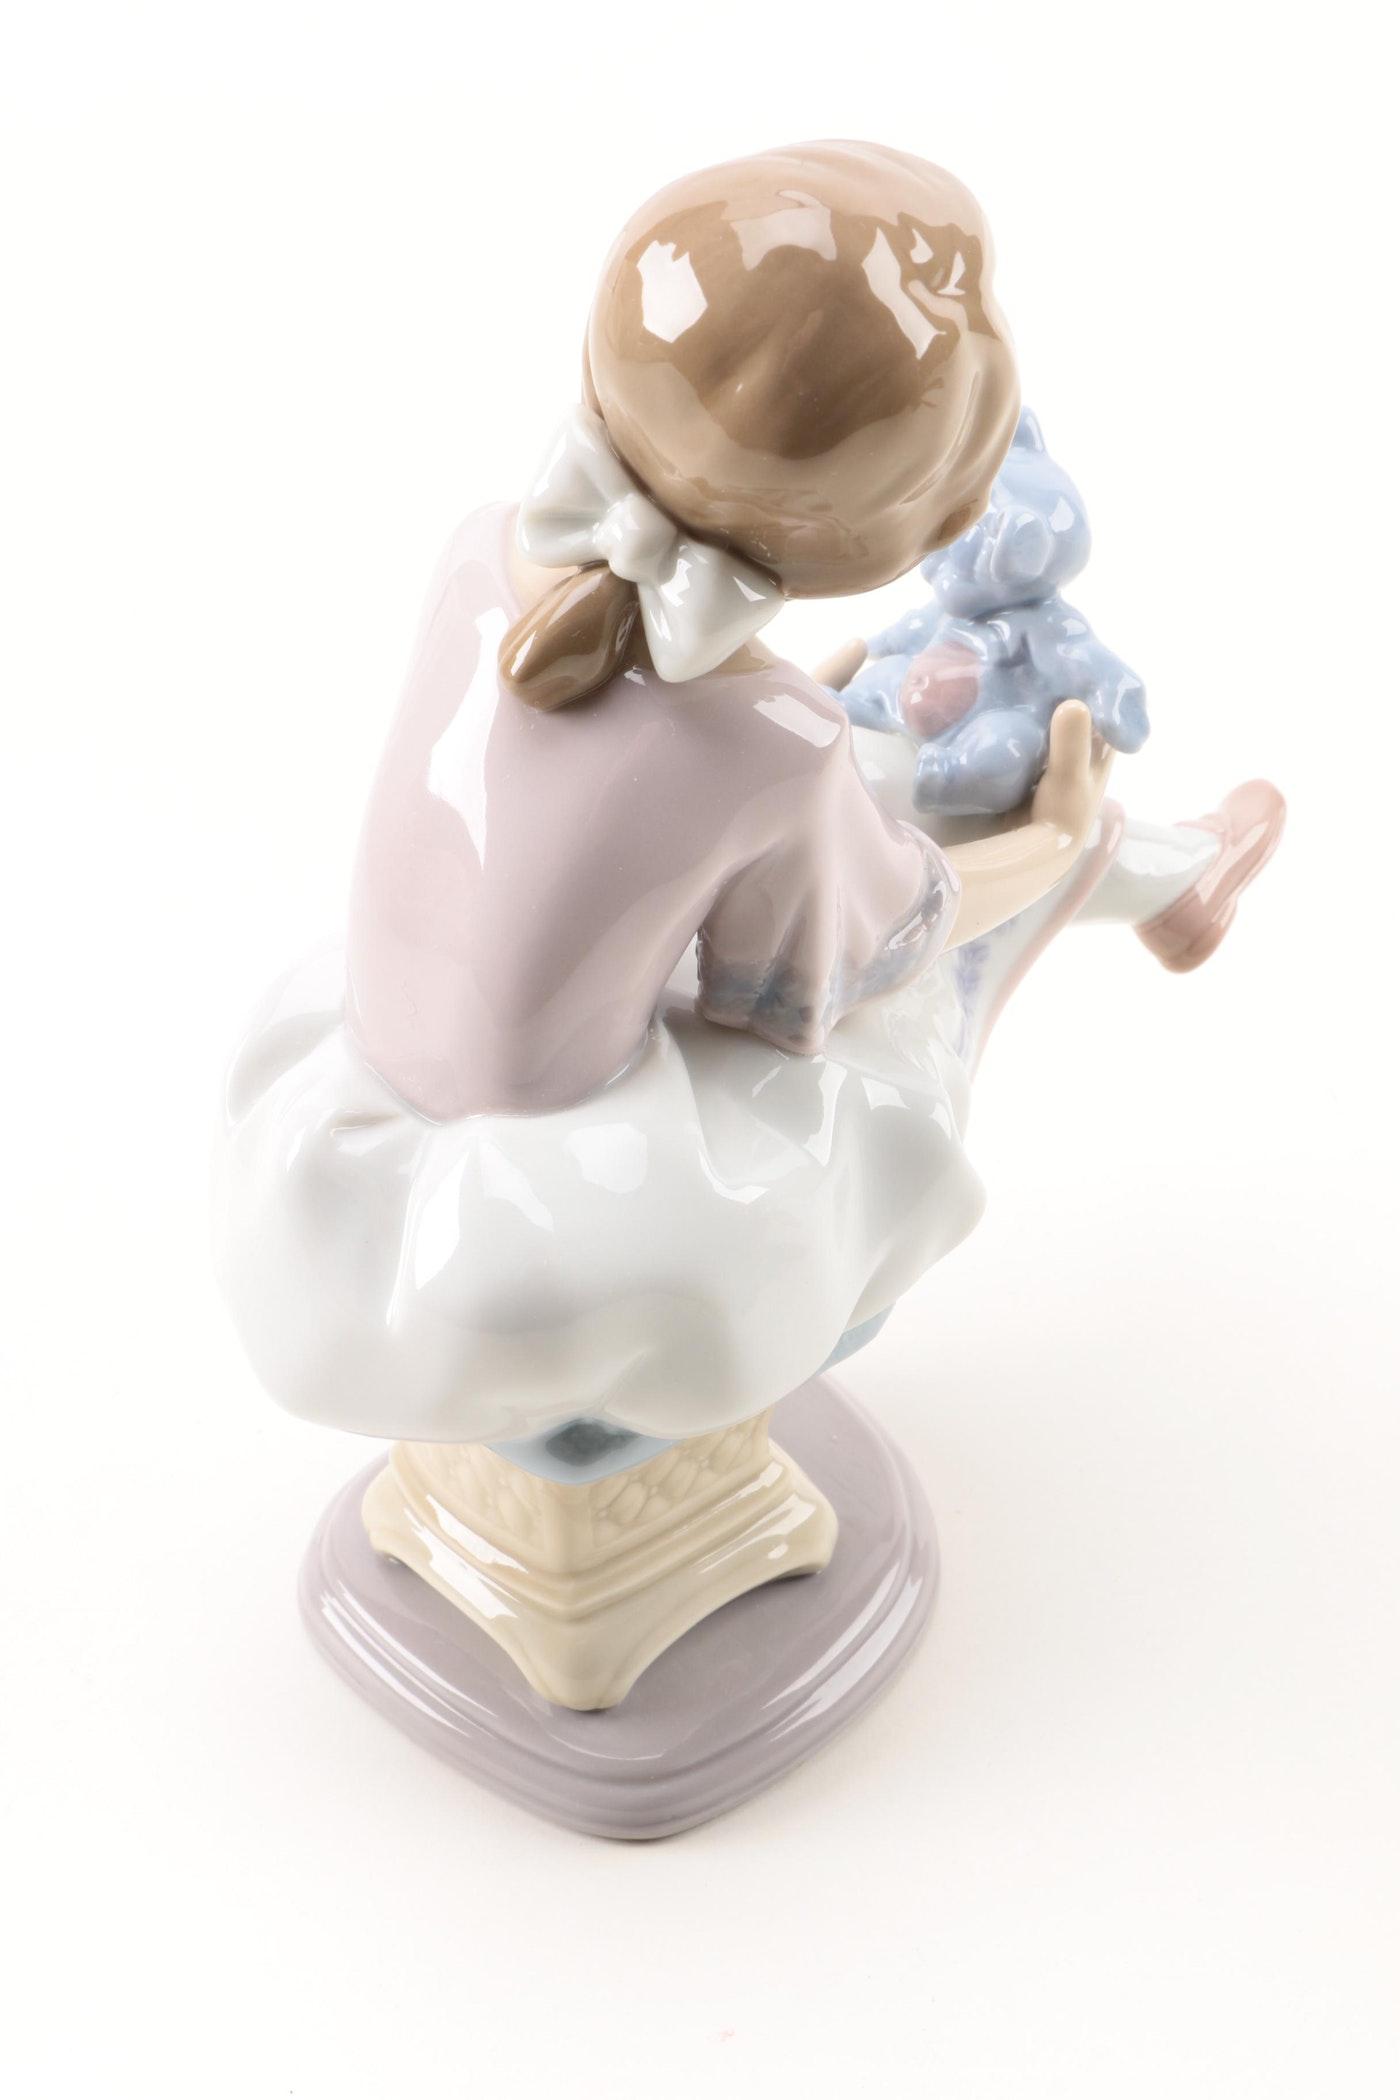 Lladr best friend figurine ebth - Consider including lladro porcelain figurines home decoration ...